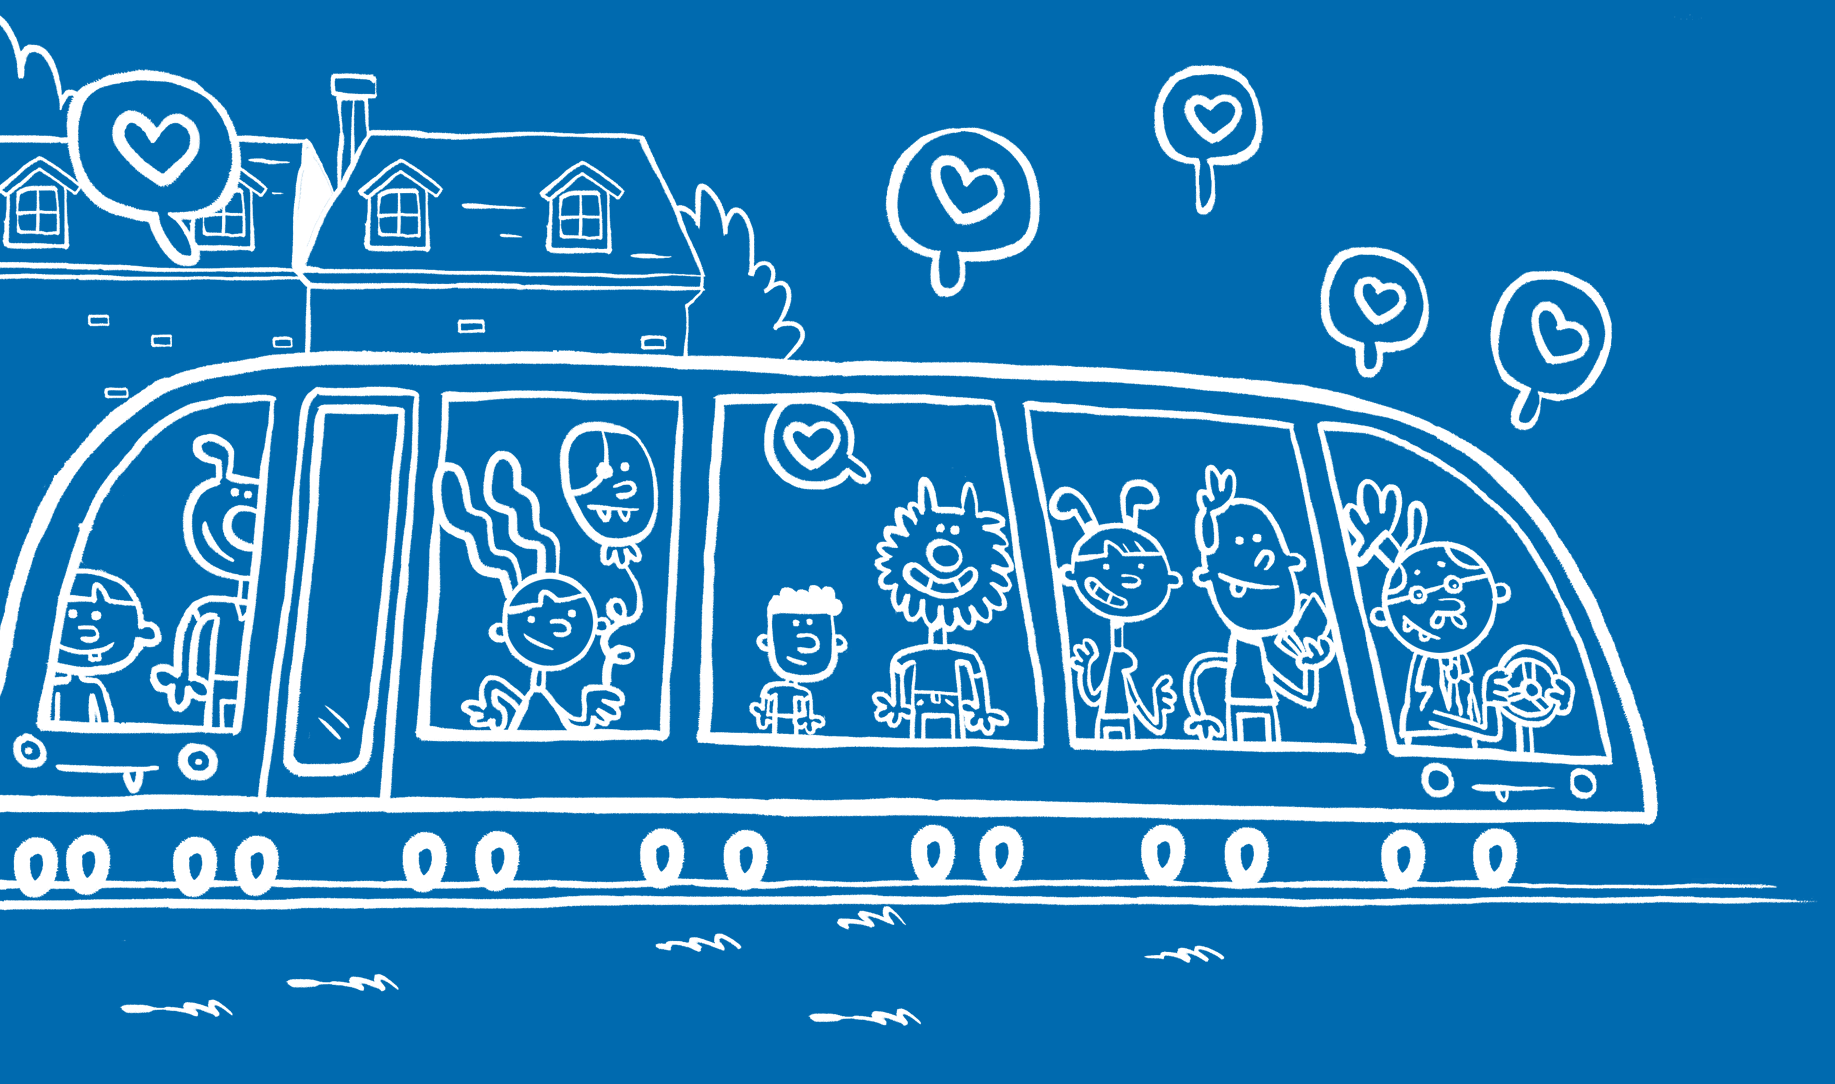 illustration j'ai hâte au tramway